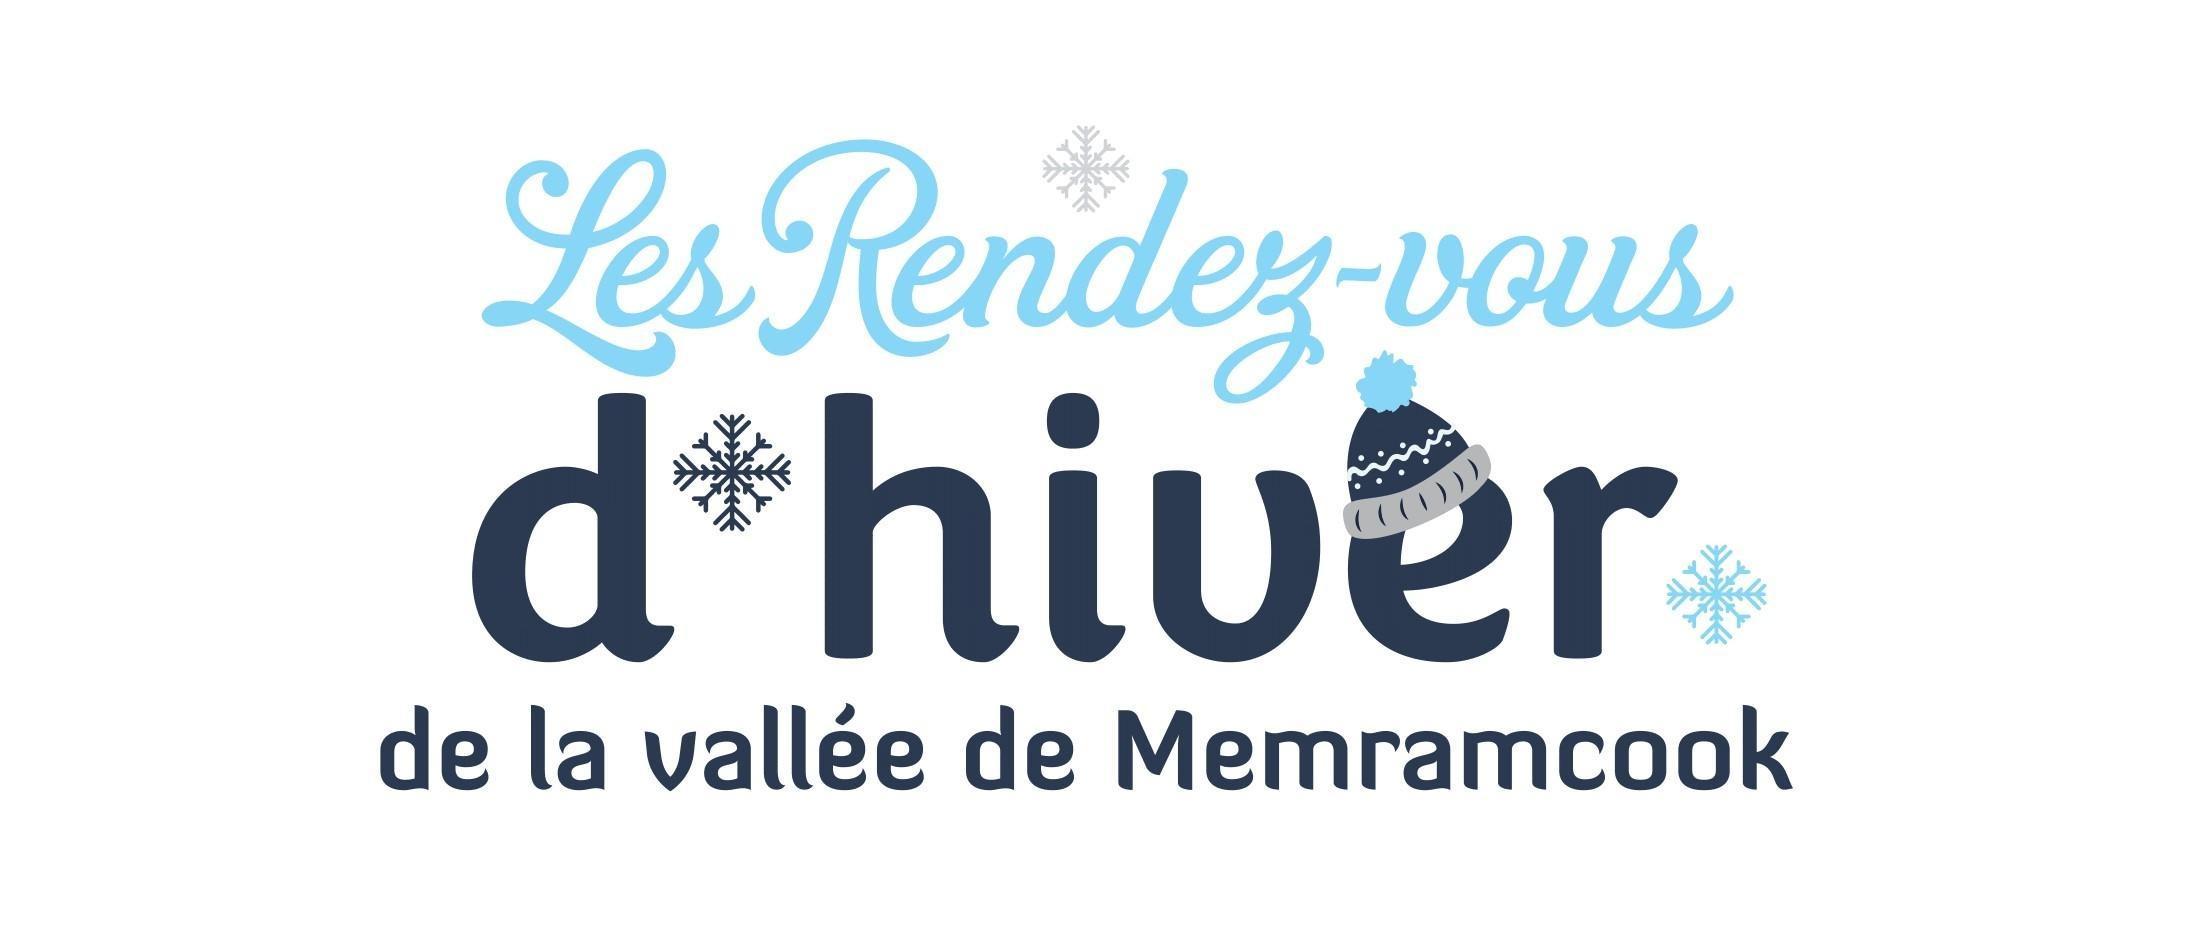 Rendez-vous-Hiver_Logo_2-1.jpg